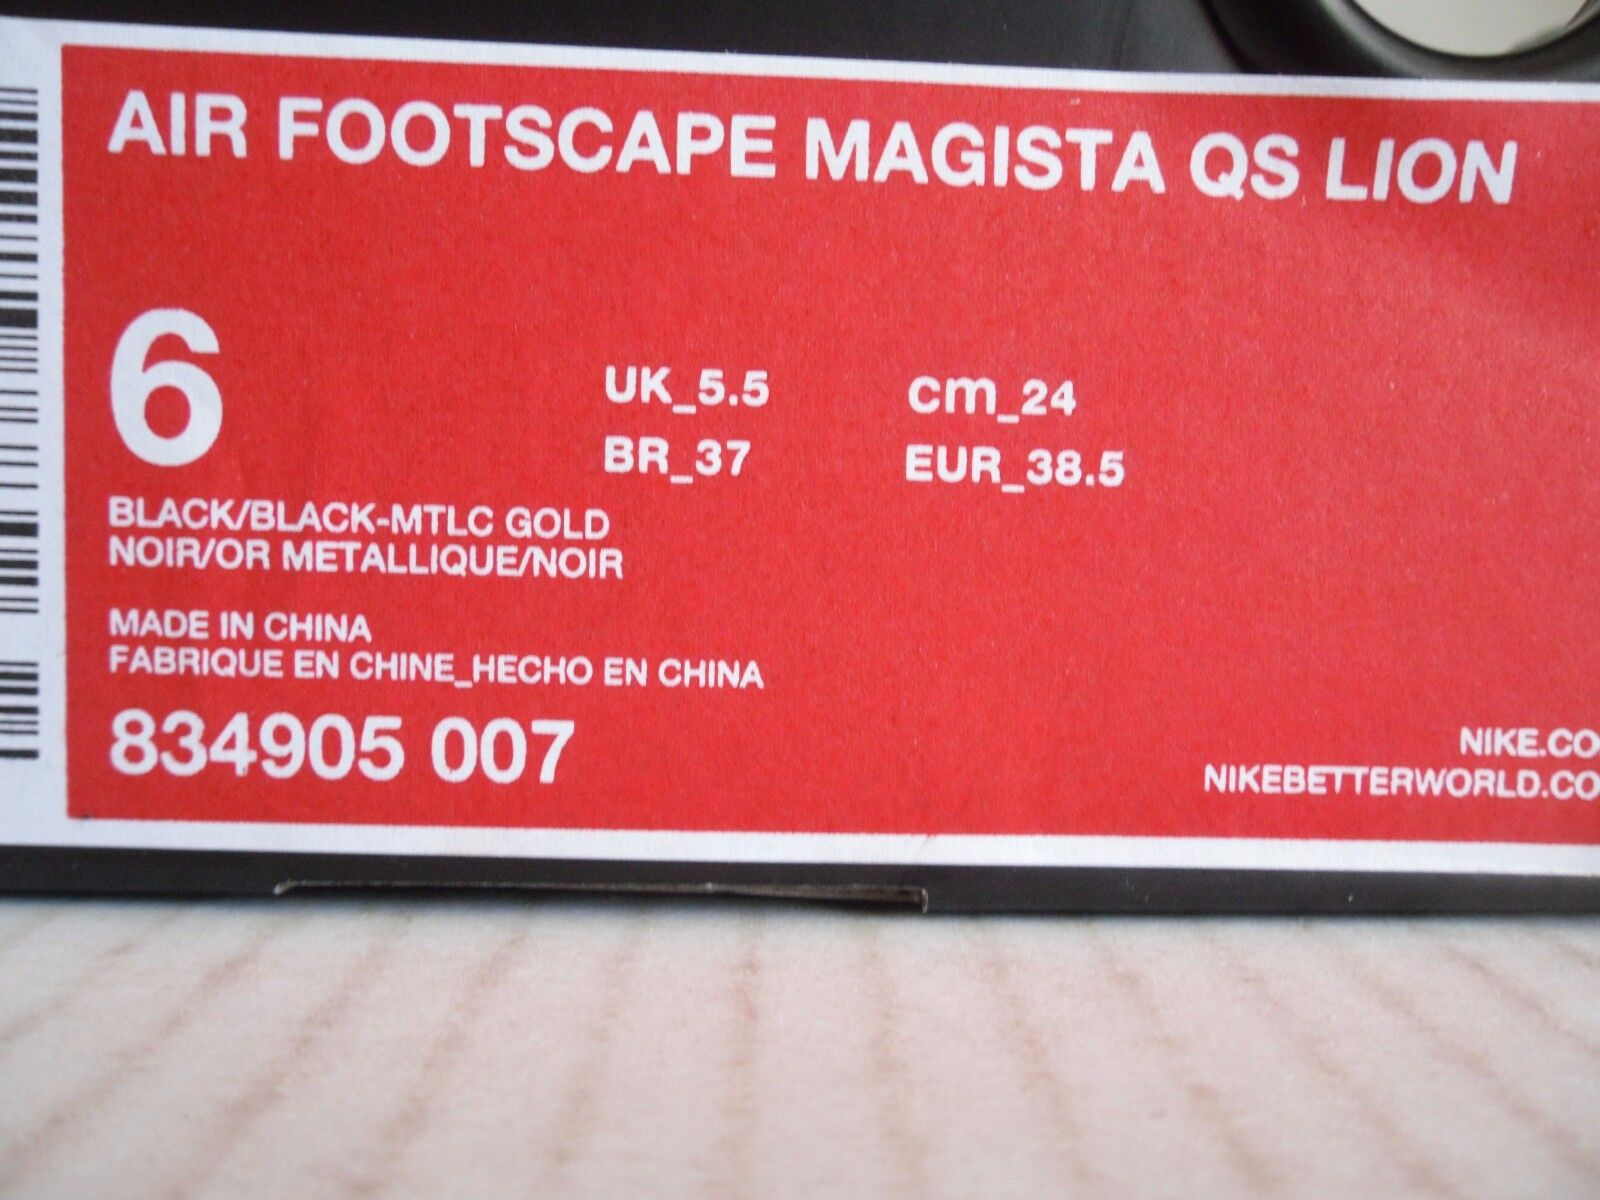 nike air footscape magista qs - löwe nikelab - x oliver rousteing sz - nikelab 6 47f913